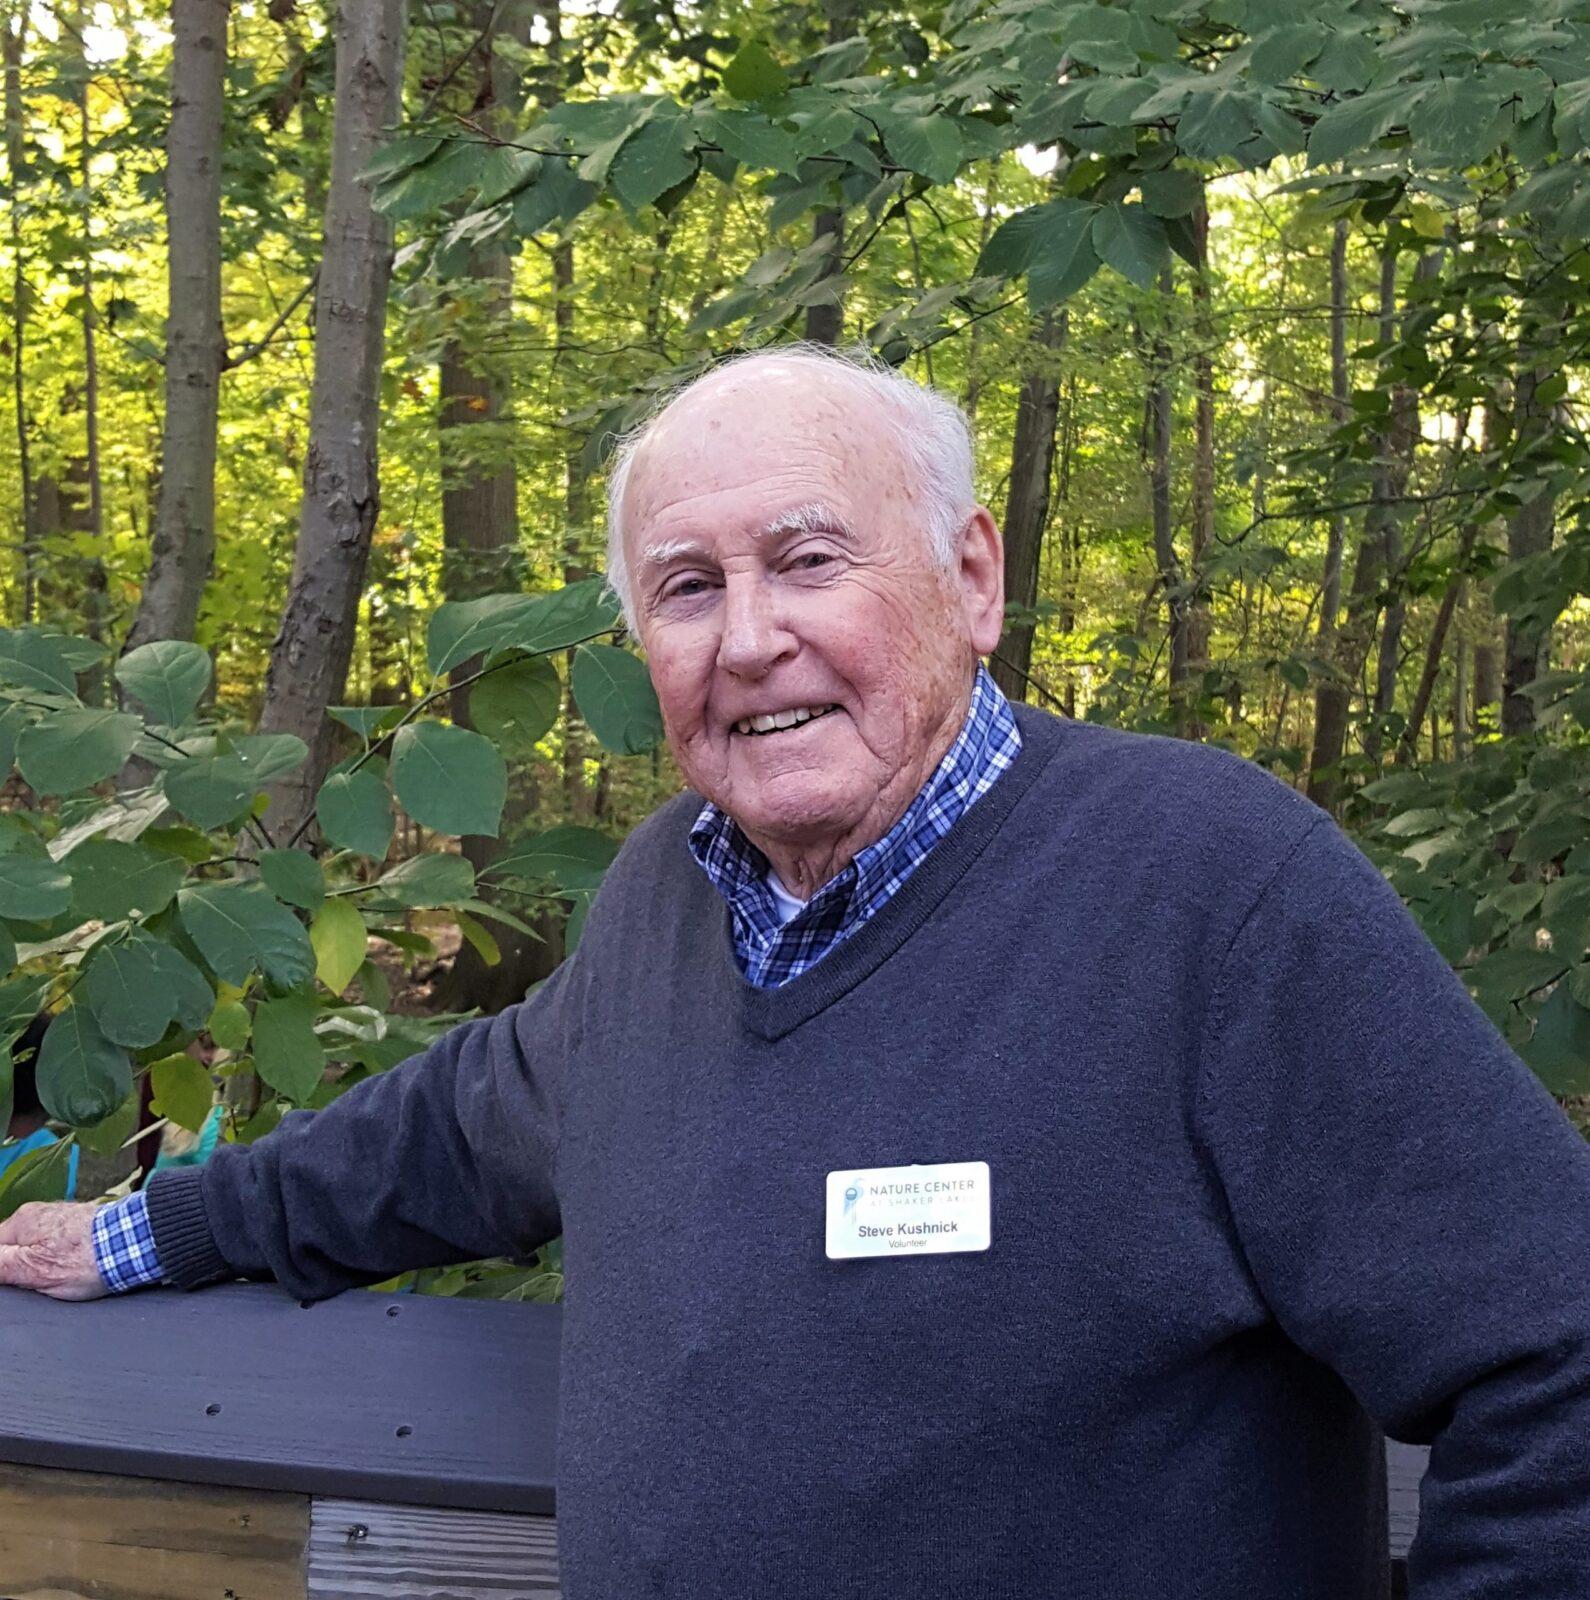 Nature Center at Shaker Lakes Steve Kushnick